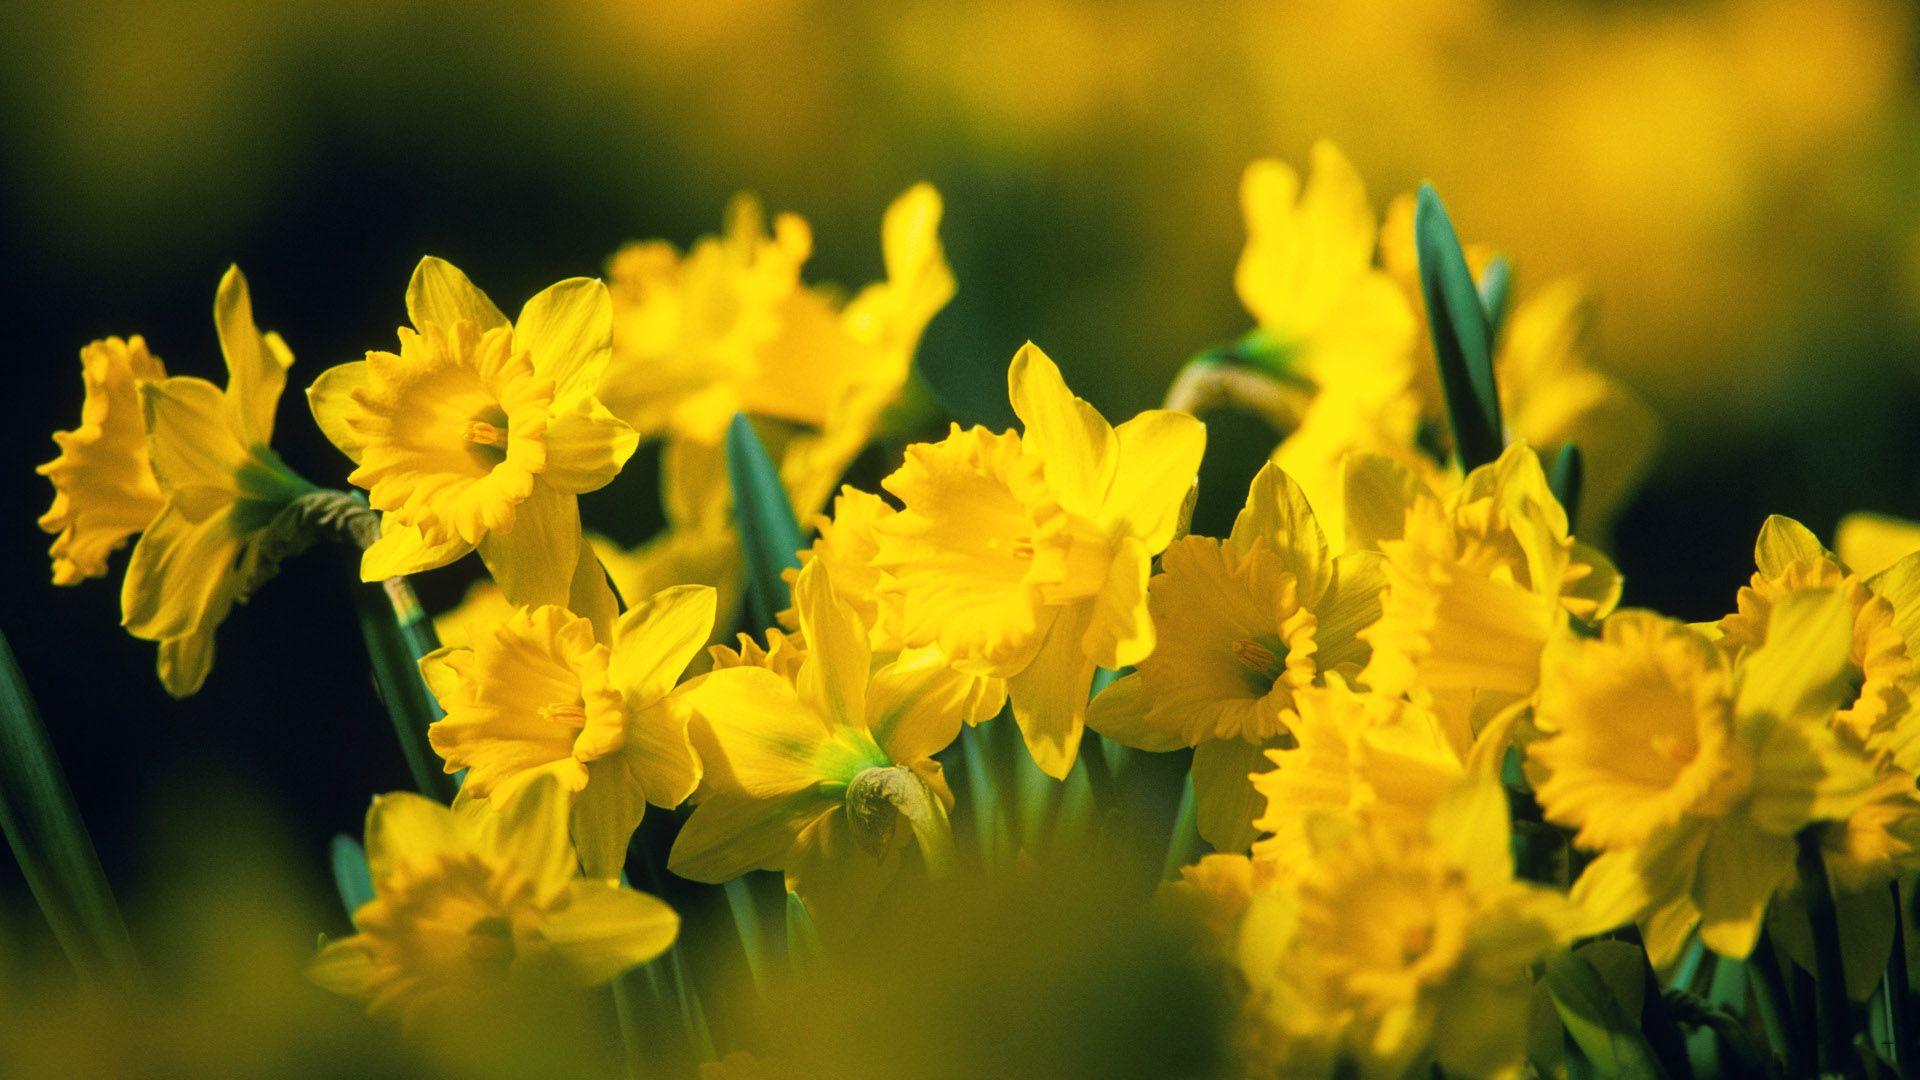 Hd wallpaper yellow flowers - Gorgeous Yellow Flowers Wallpaper